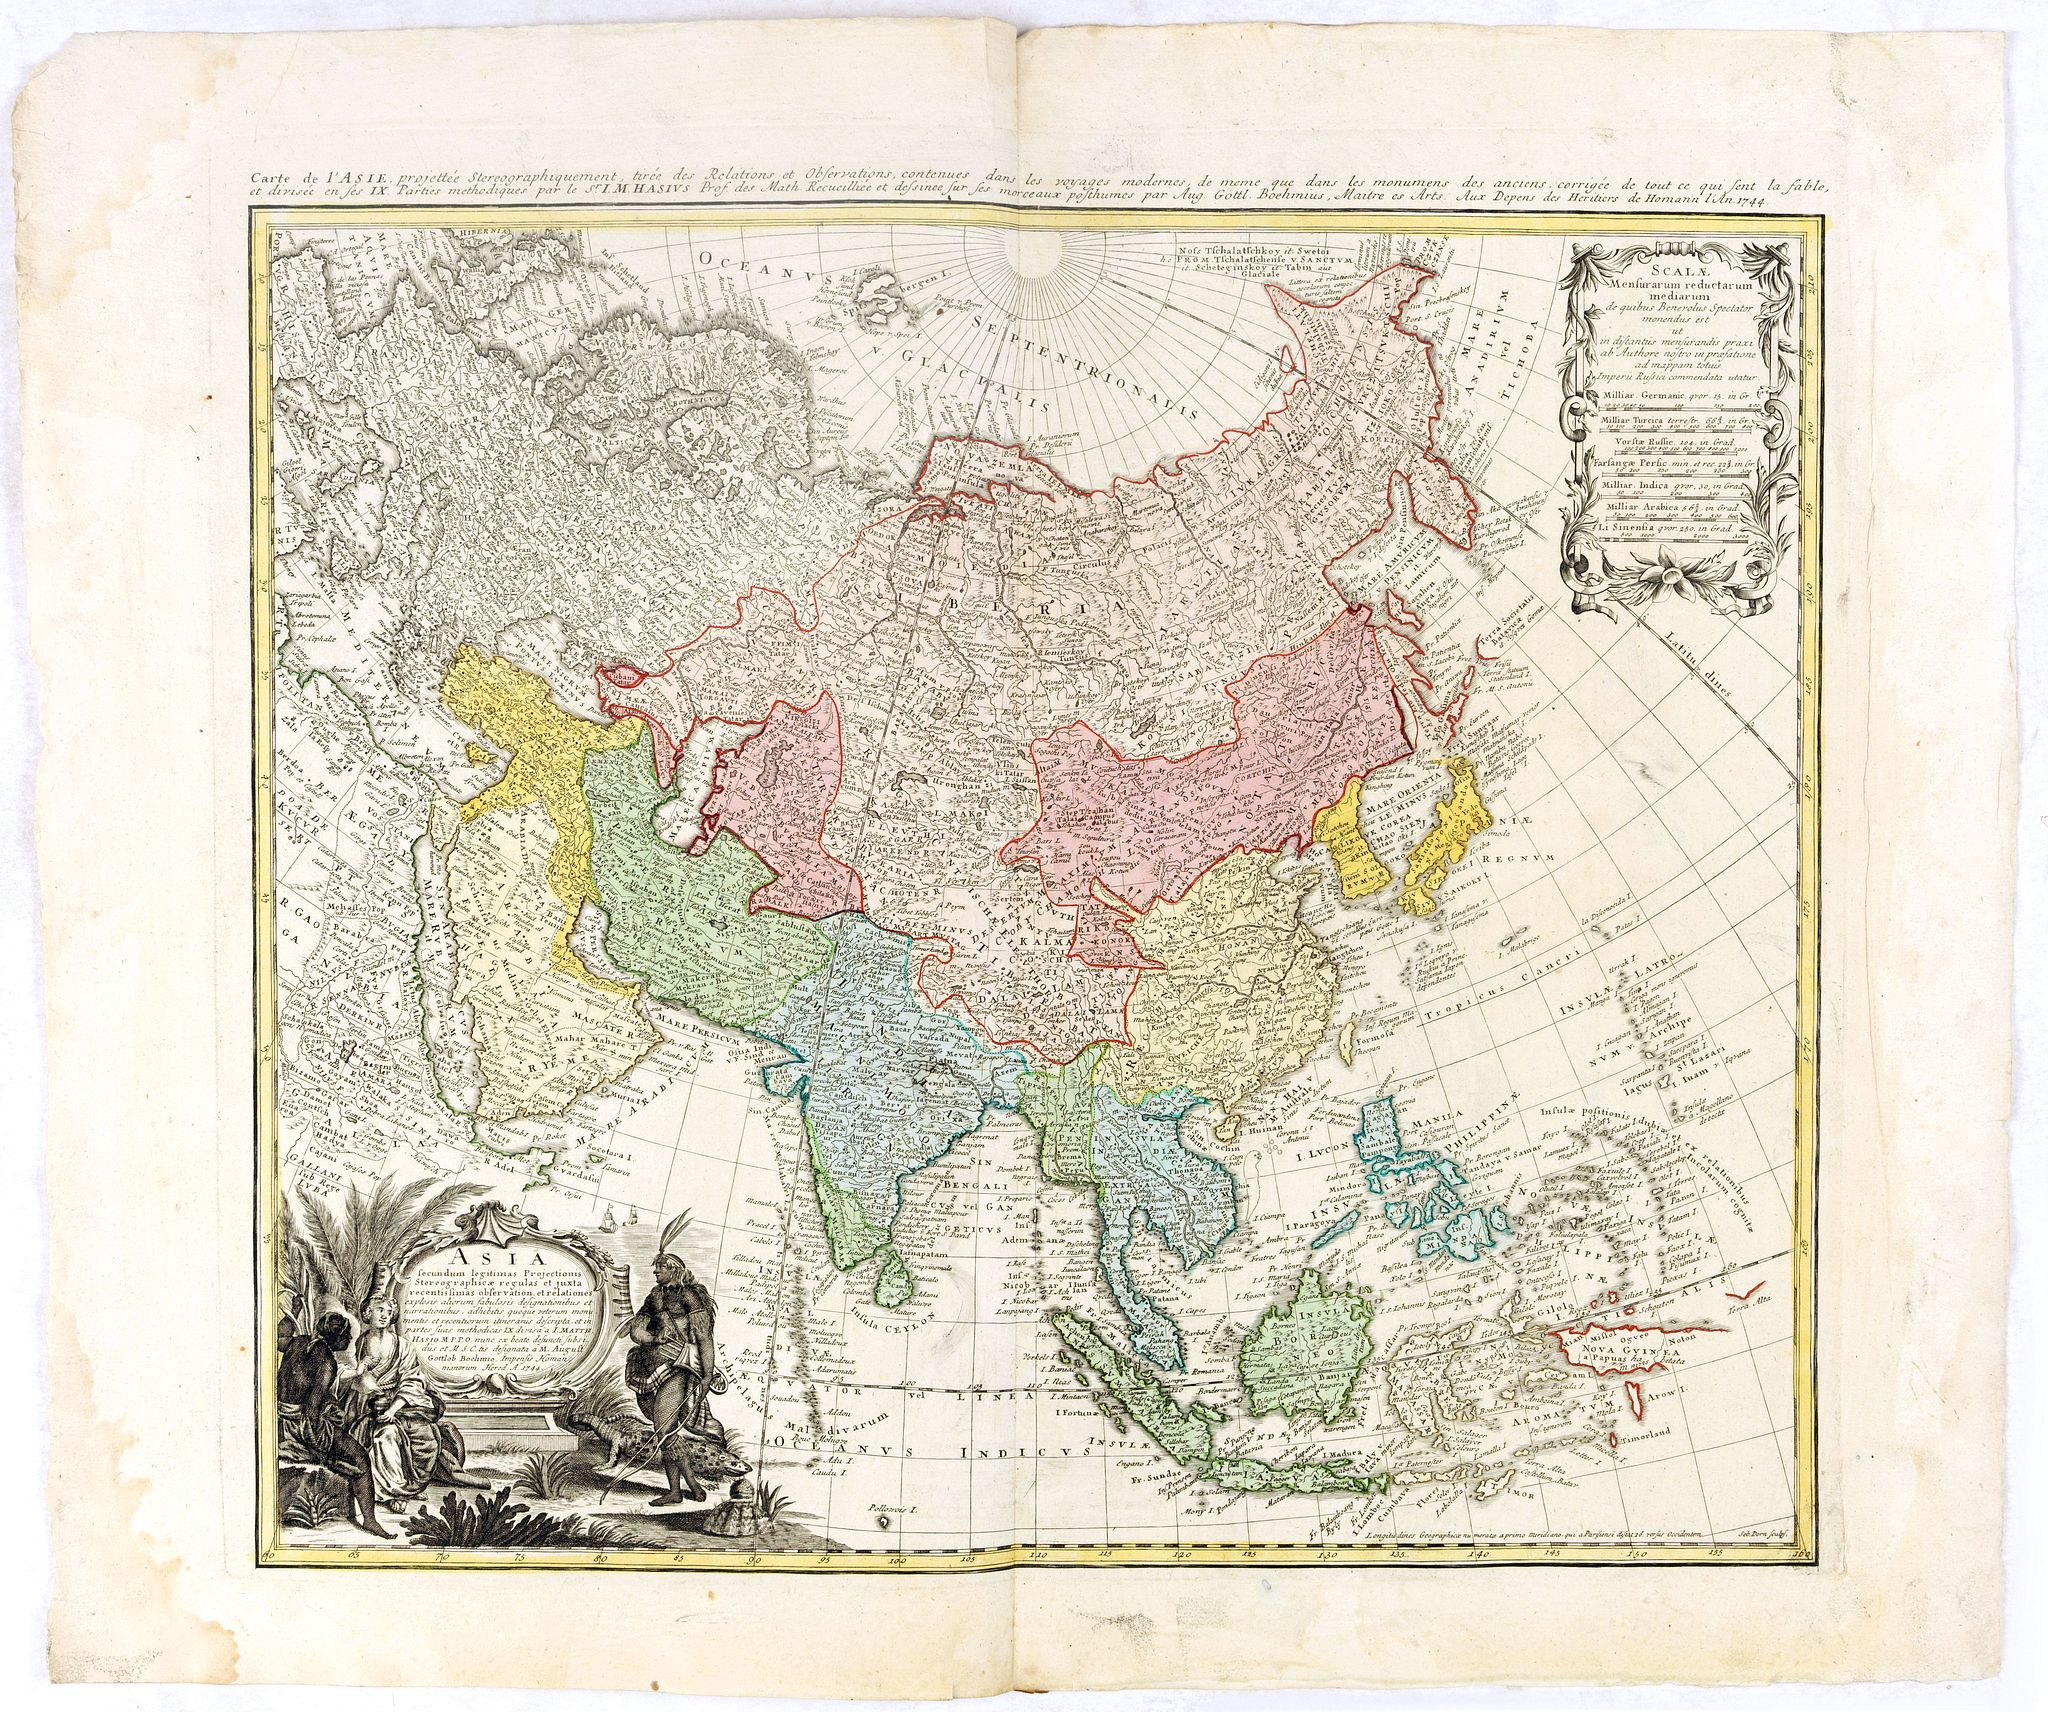 HOMANN HEIRS. -  Asia secundum legitimas projectionis stereographicae.